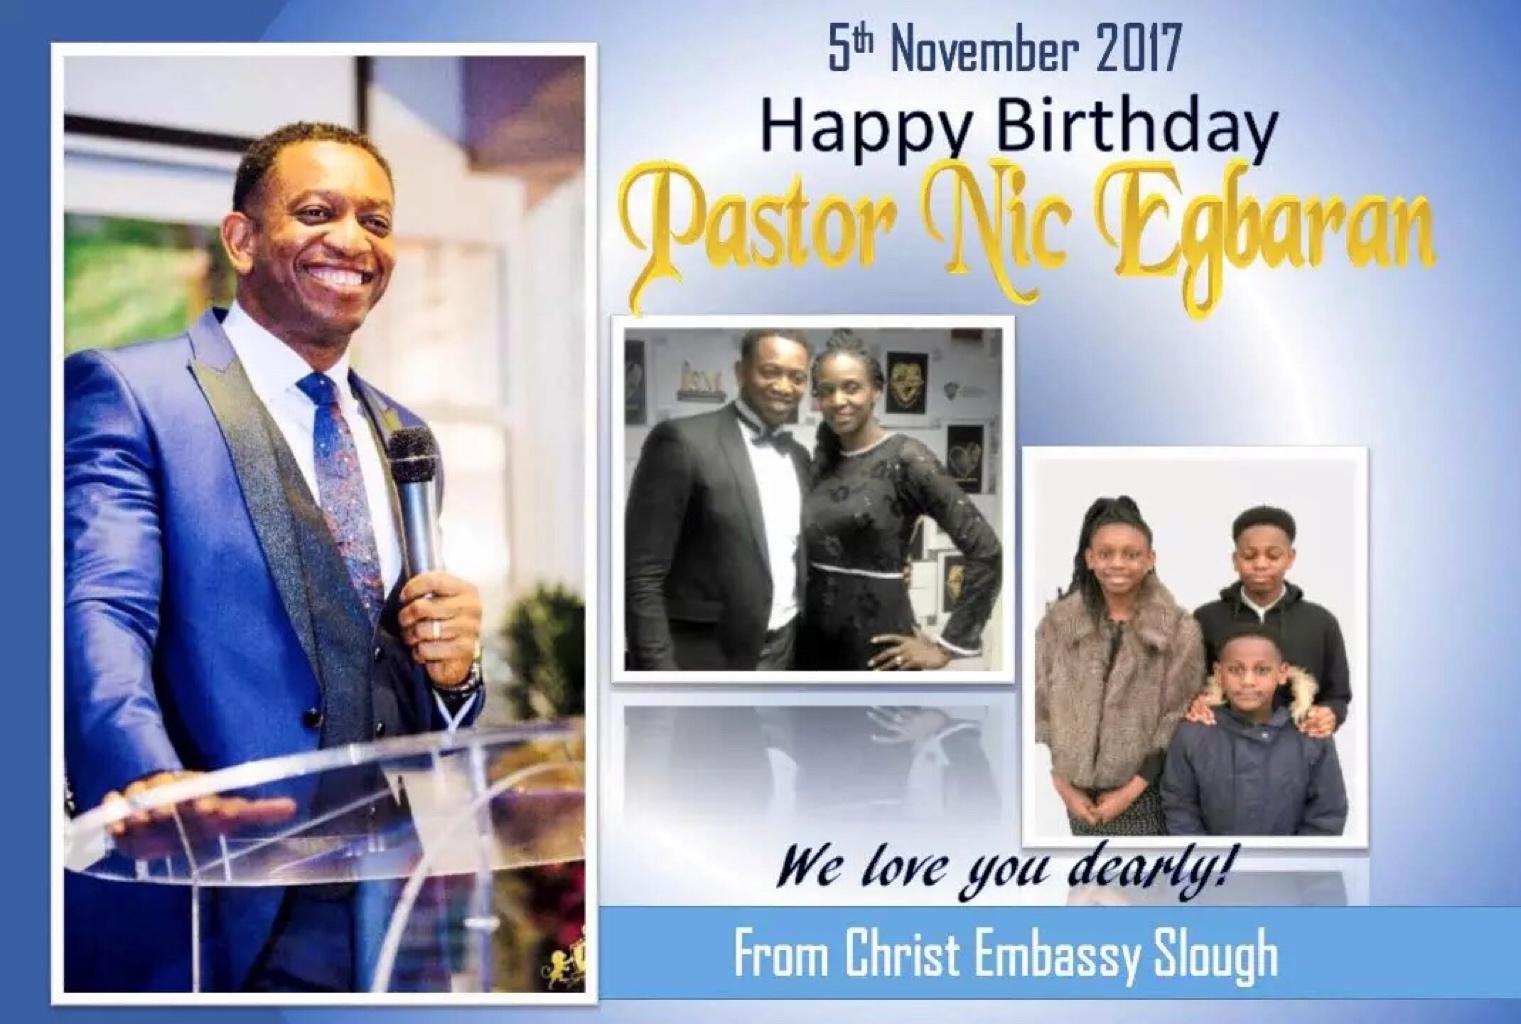 Happy birthday to a Pastor